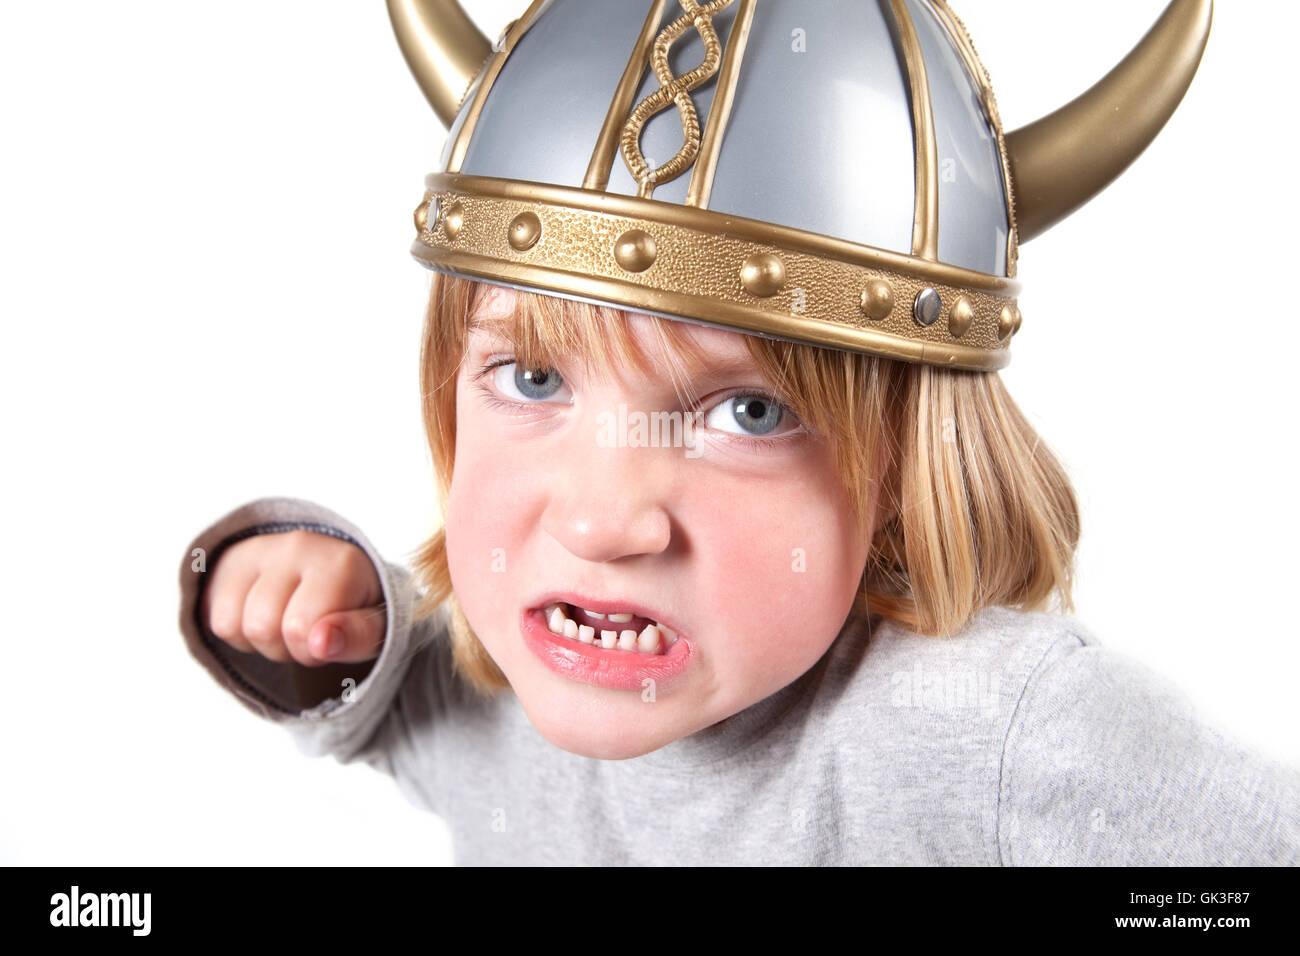 costume viking aggression - Stock Image